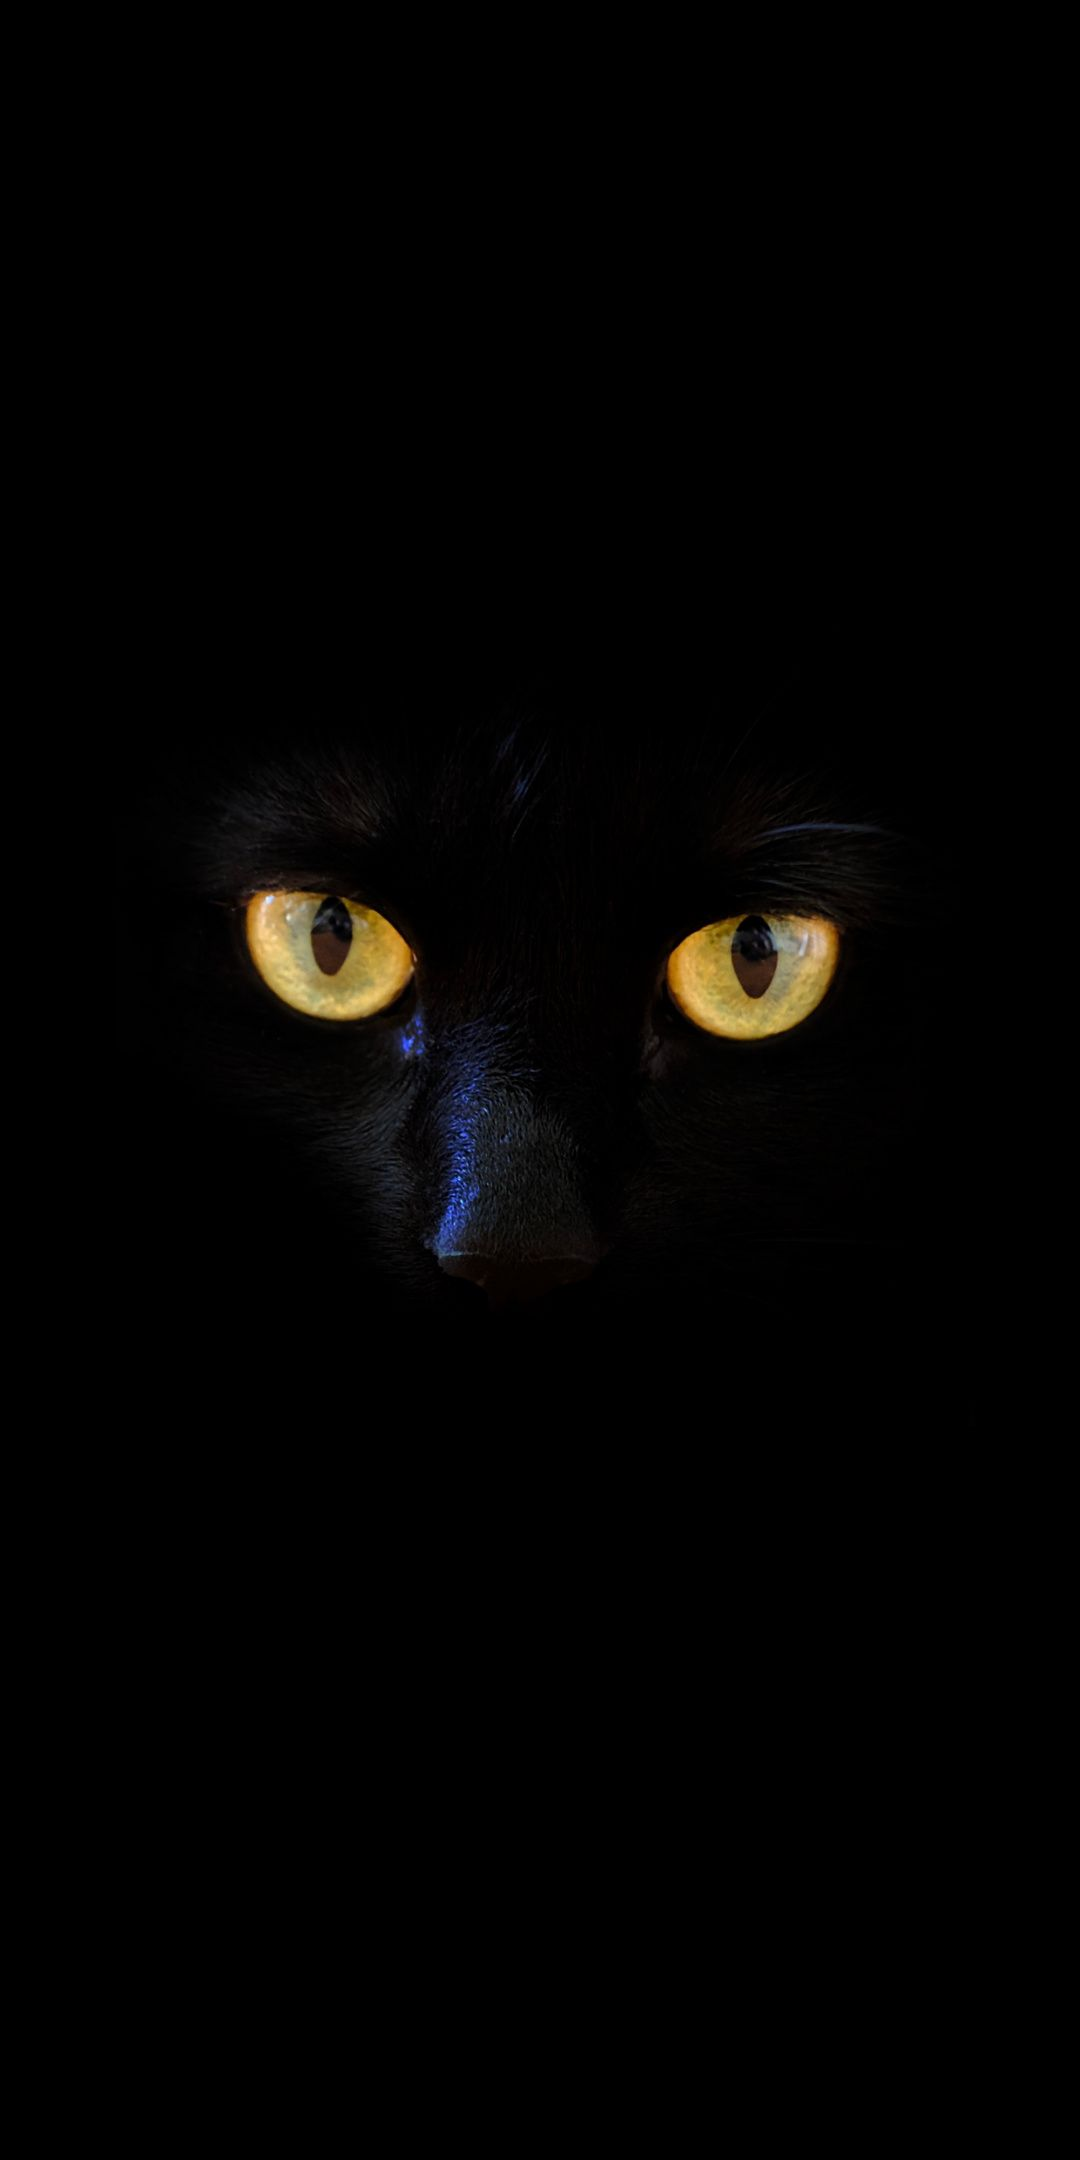 Black Cat Yellow Eyes Portrait 1080x2160 Wallpaper Cat Portraits Yellow Eyes Black Cat